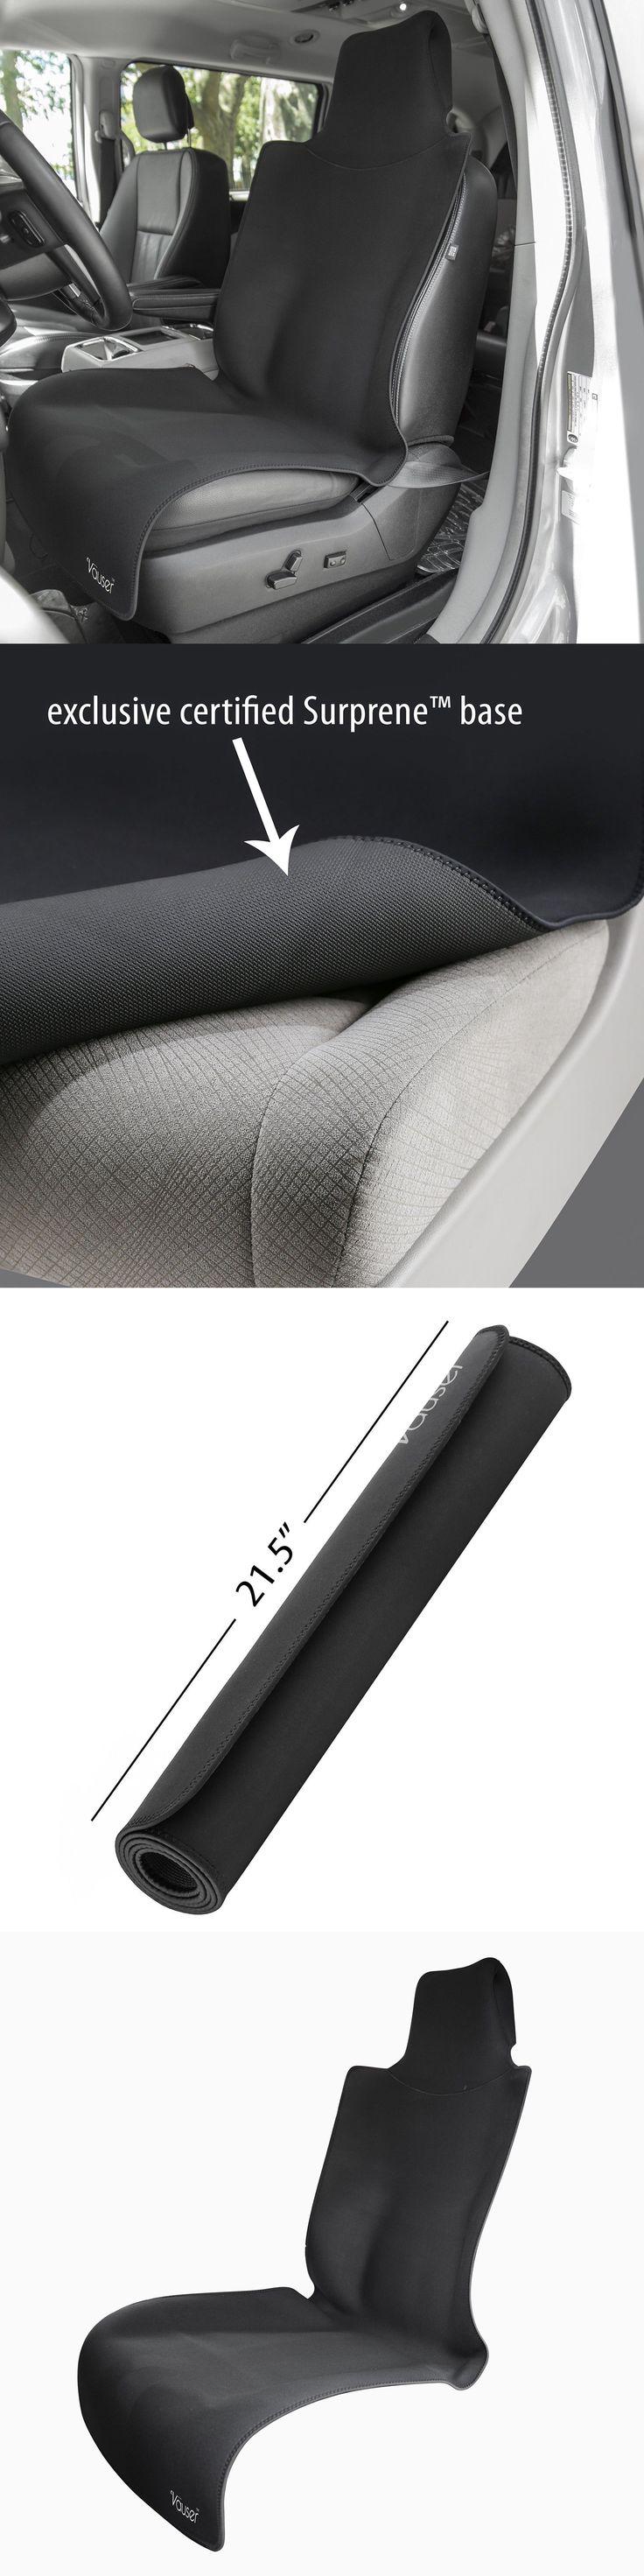 Car seat covers 117426 waterproof car seat cover durable neoprene by vauser tm universal